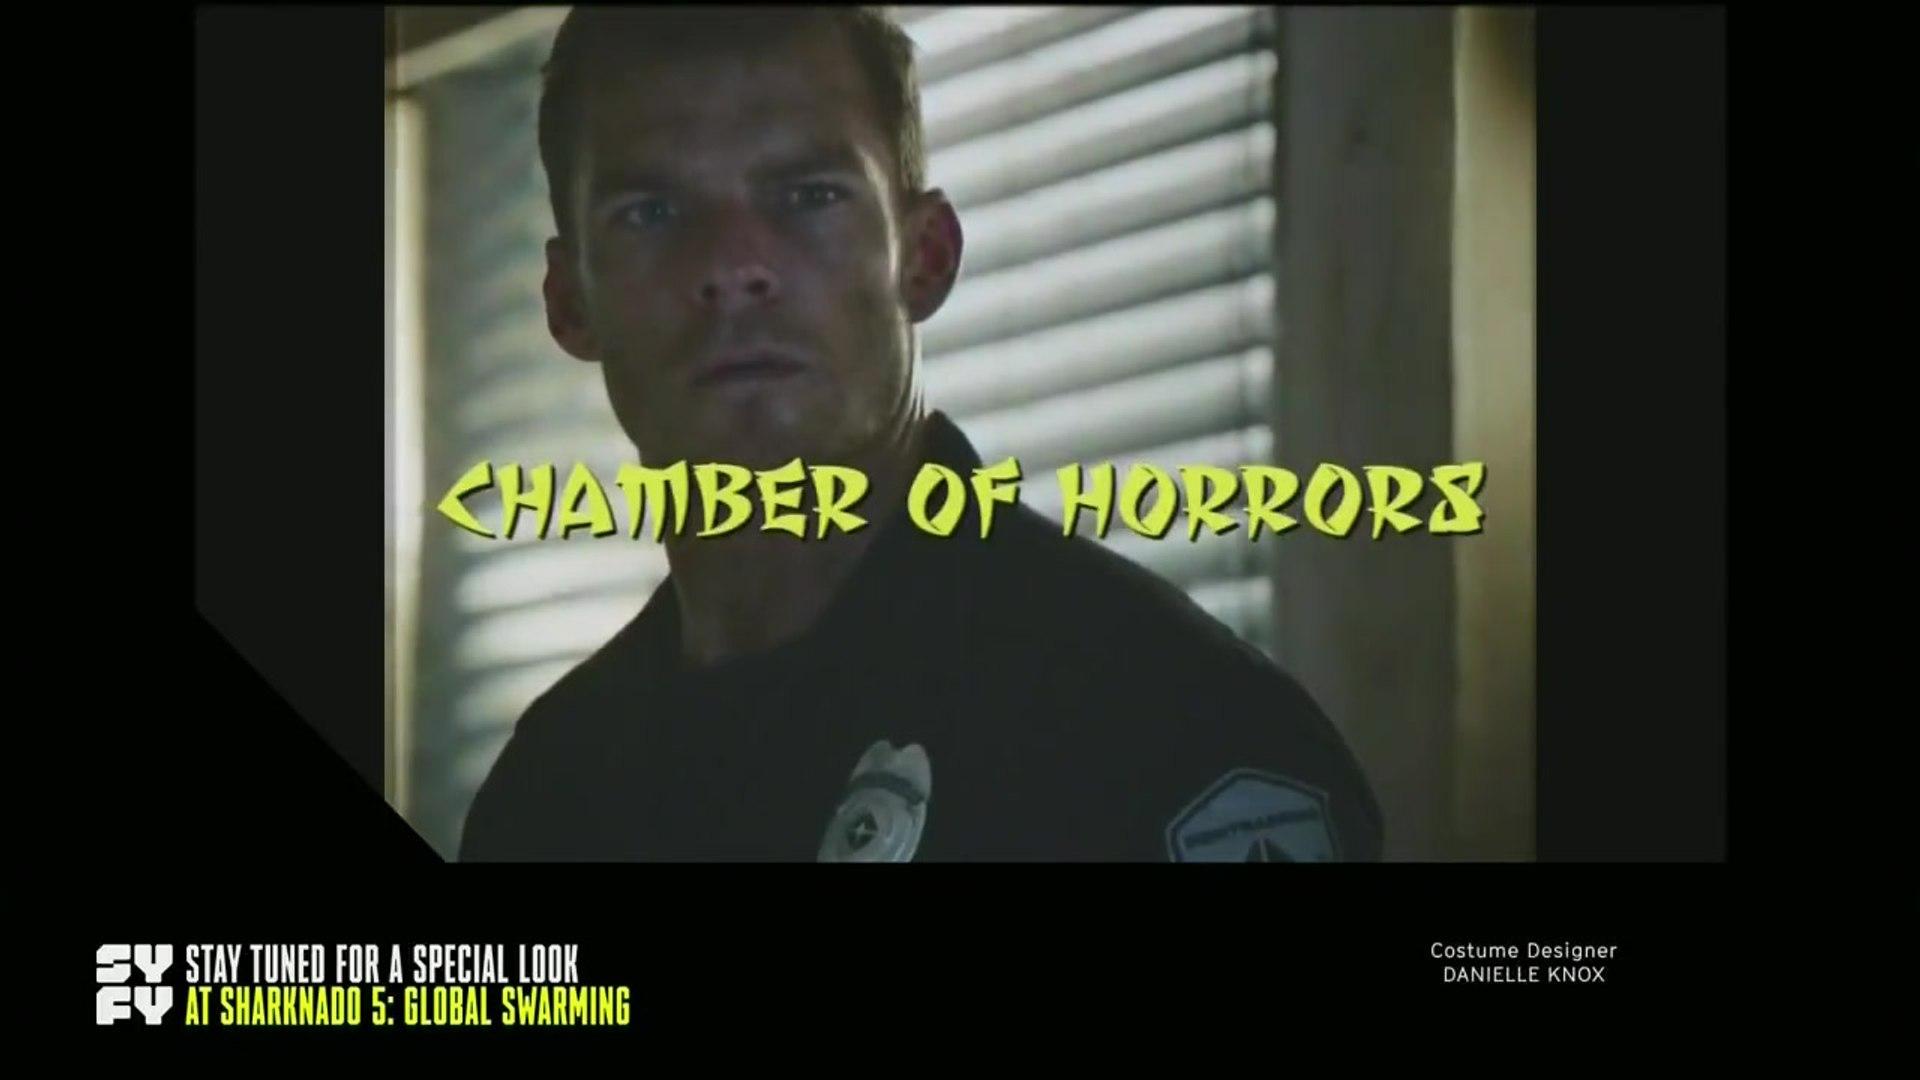 Blood Drive Season 1 Episode 10 Full [PROMO] Streaming HD